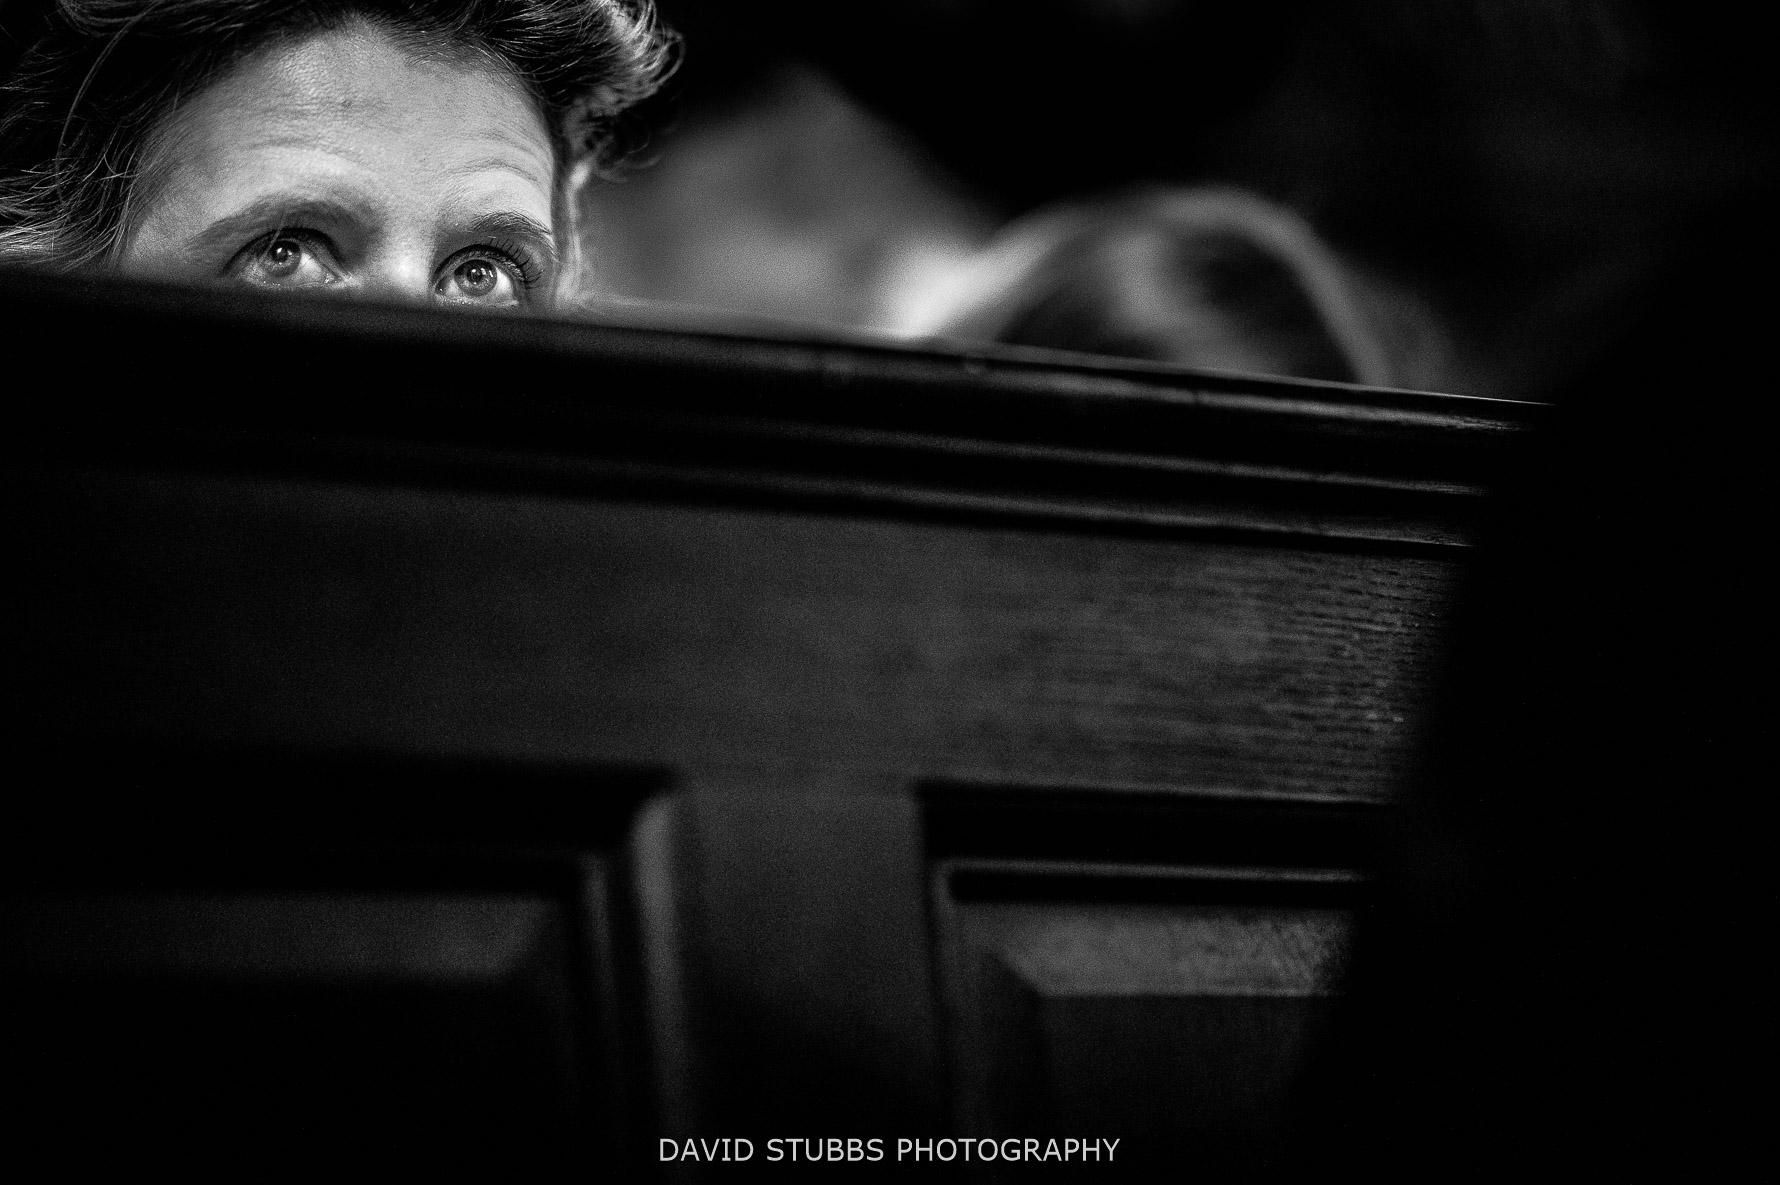 eyes peeping